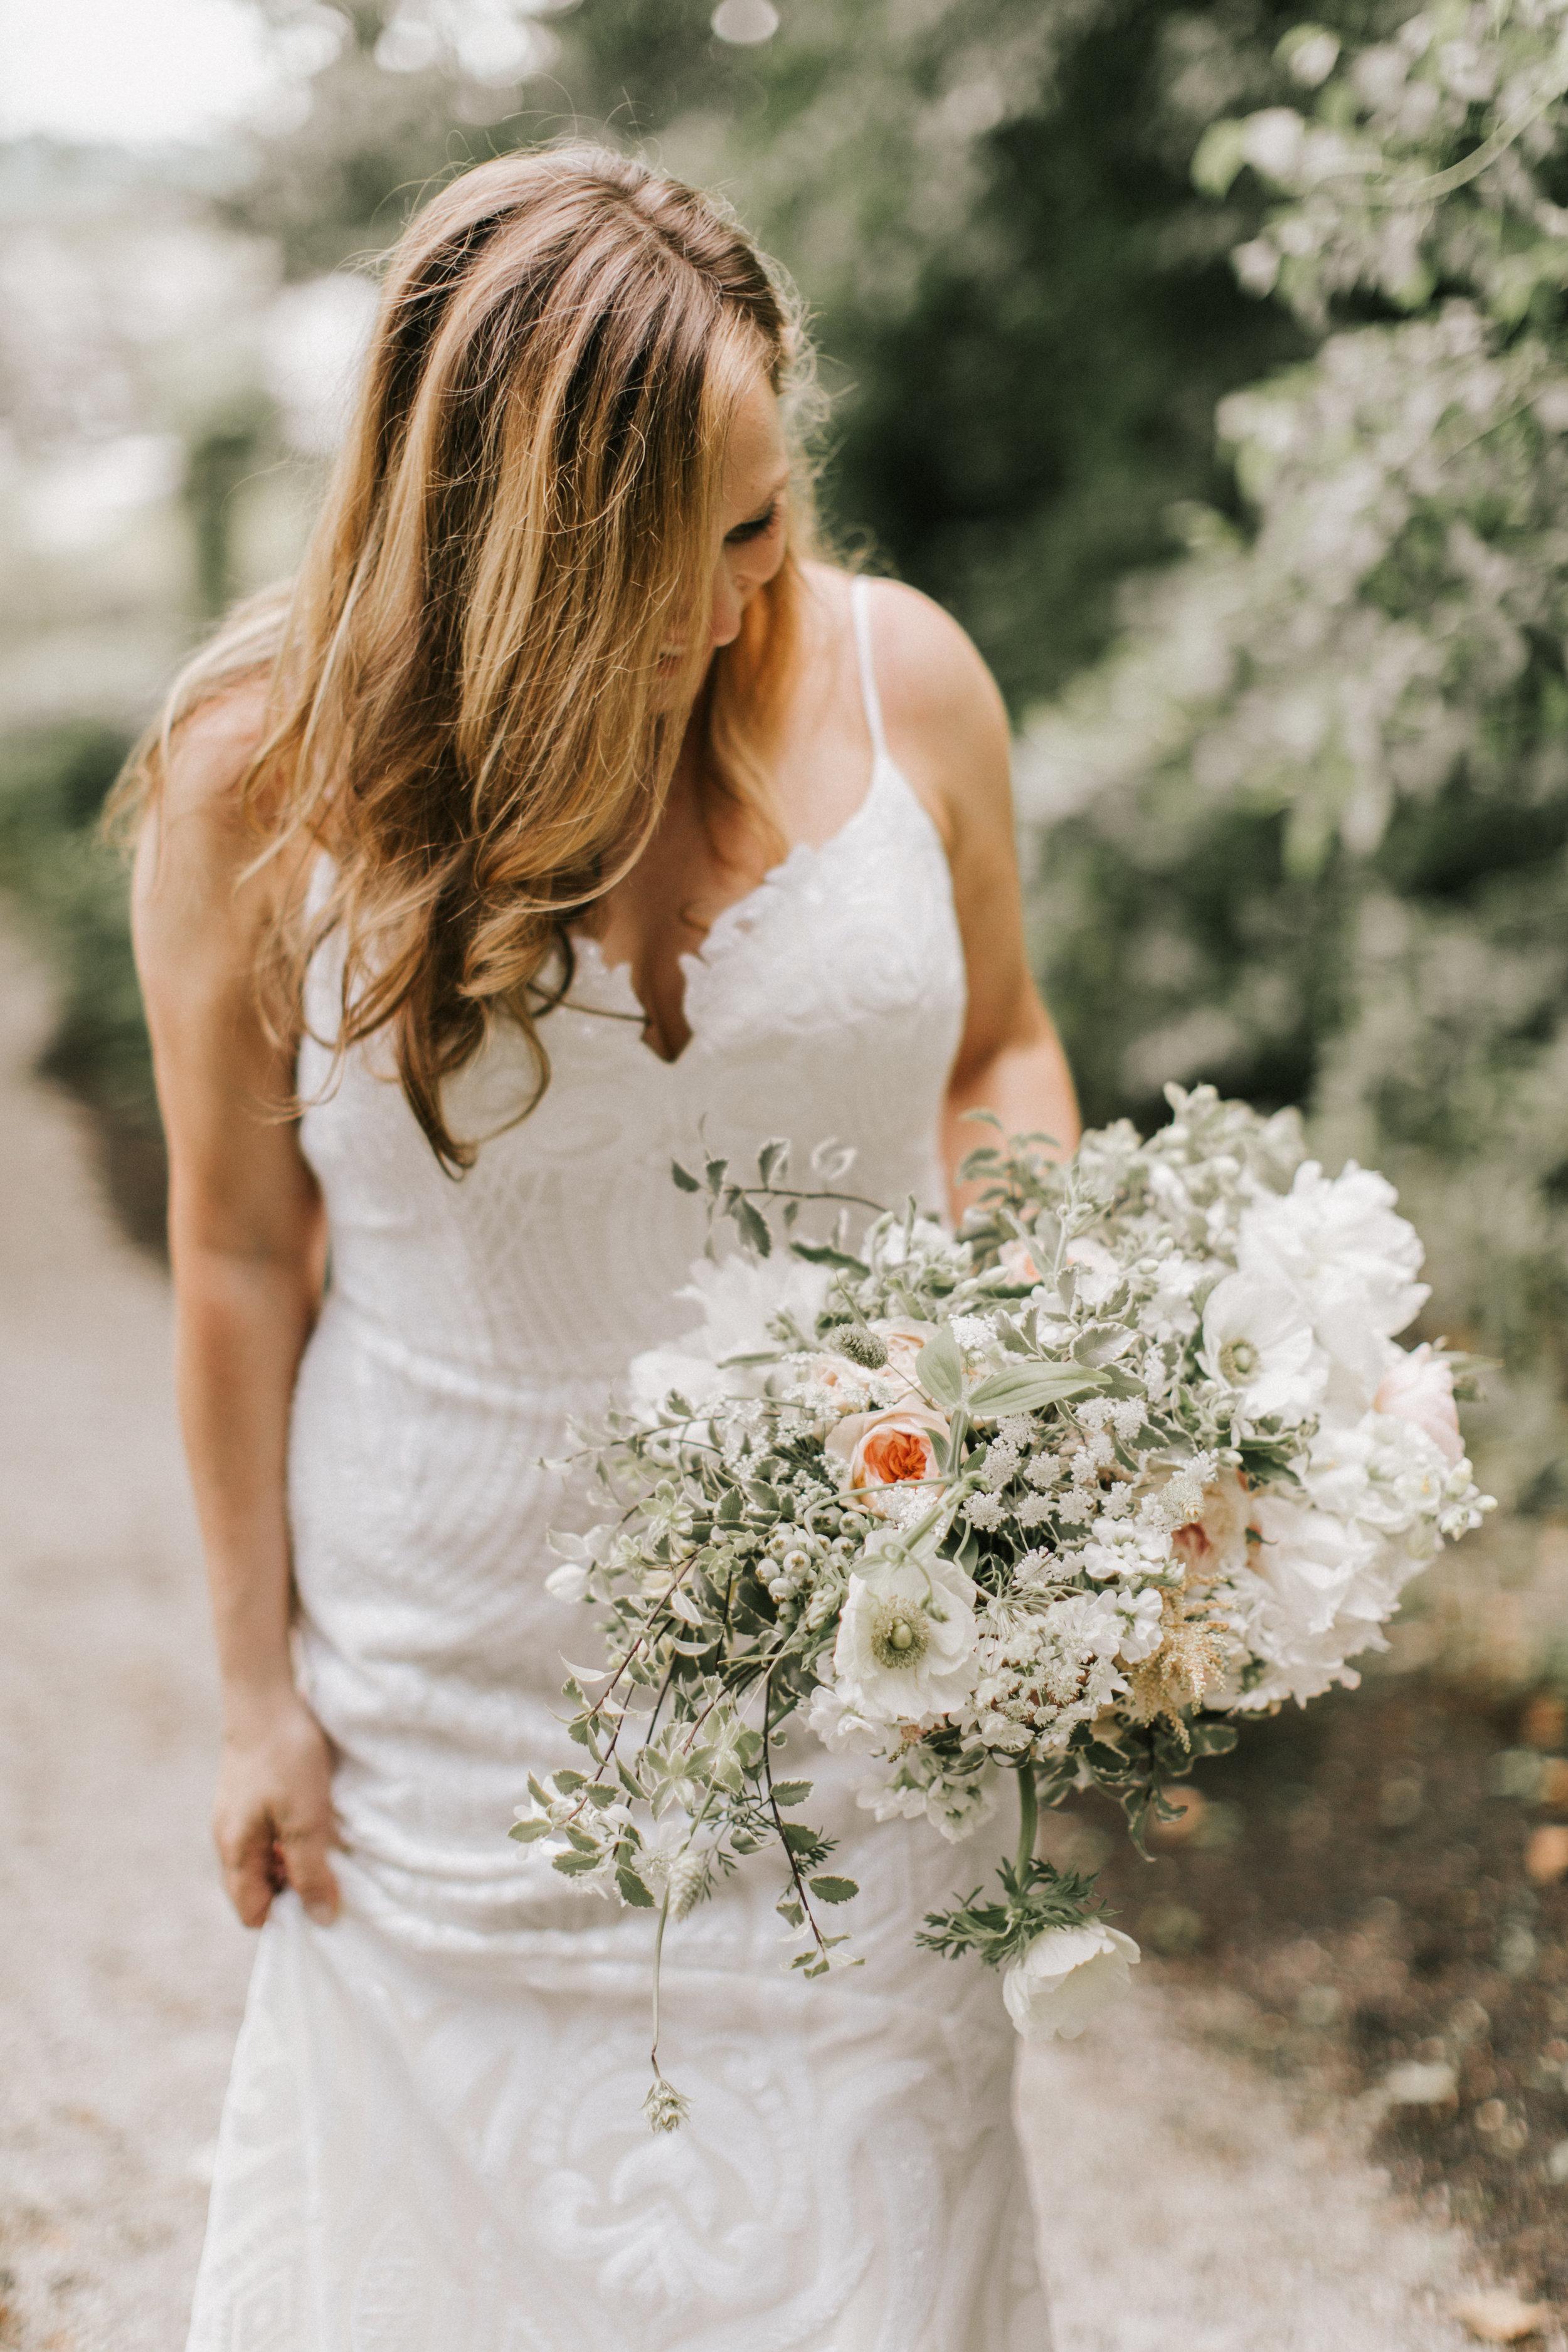 Watershed_Floral_Marianmade_Farm_Wedding_JamieMercurioPhoto2018-131.jpg